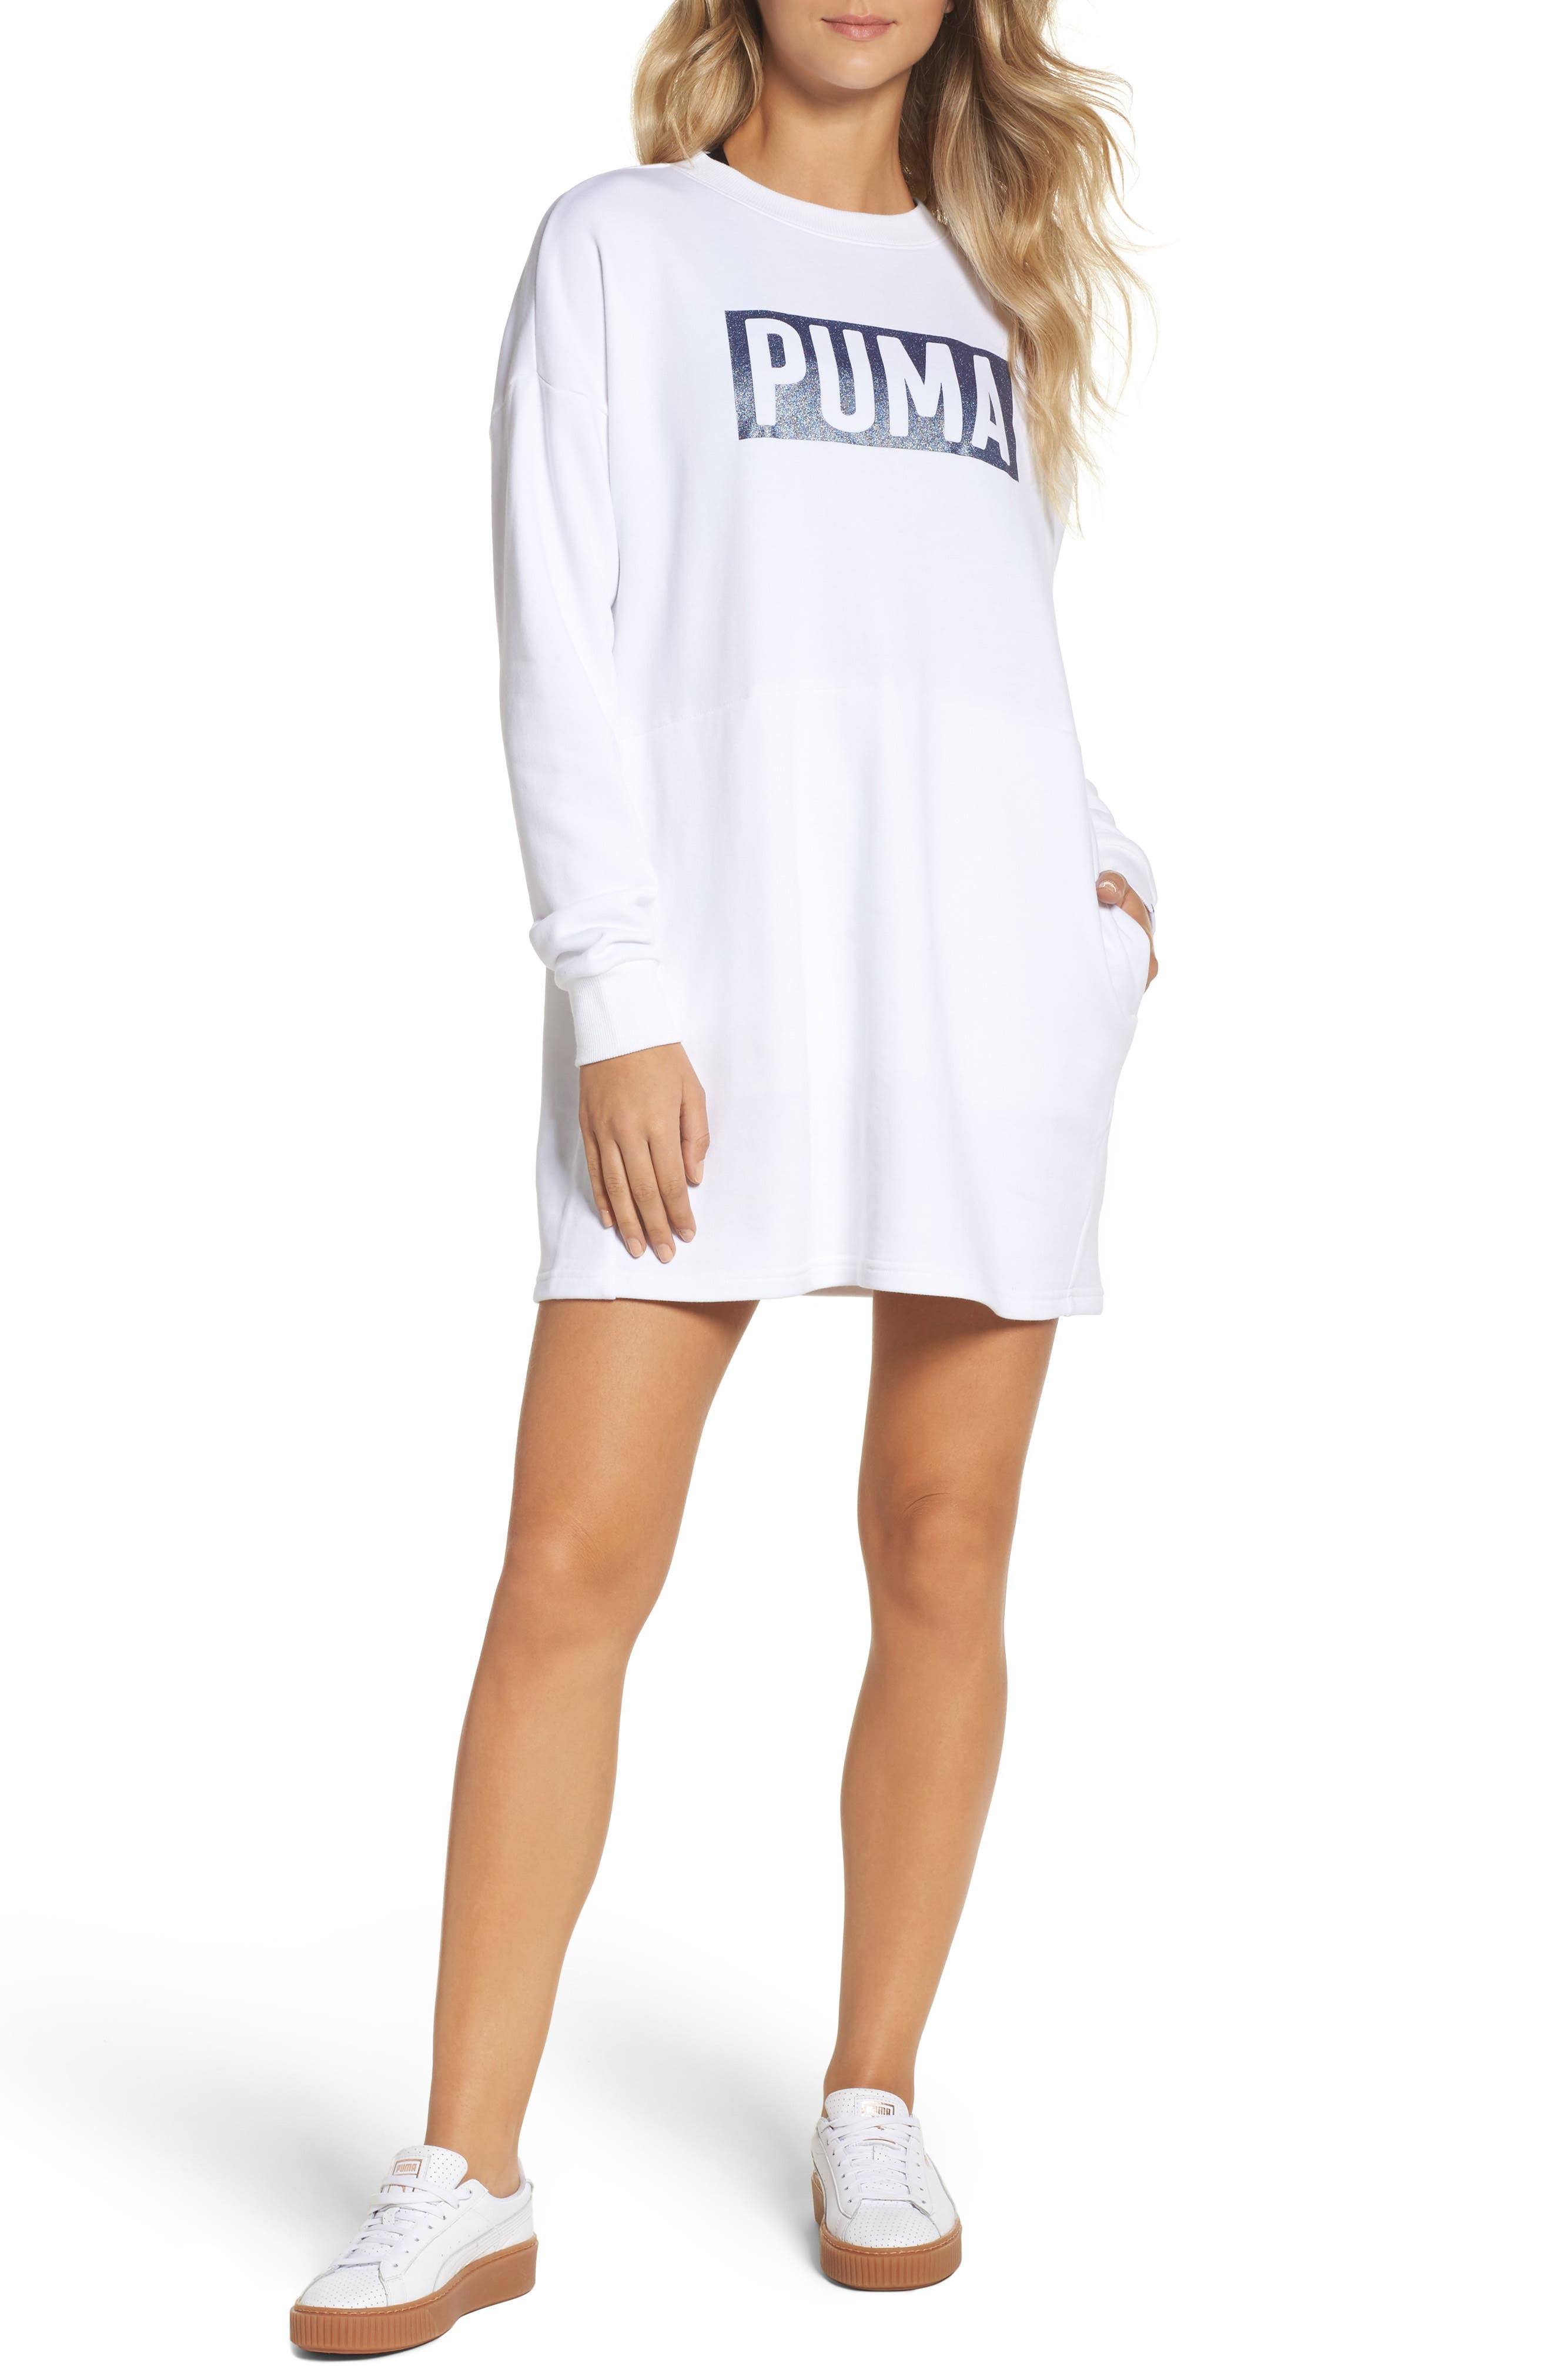 Alternate Image 1 Selected - PUMA Fusion Sweatshirt Dress